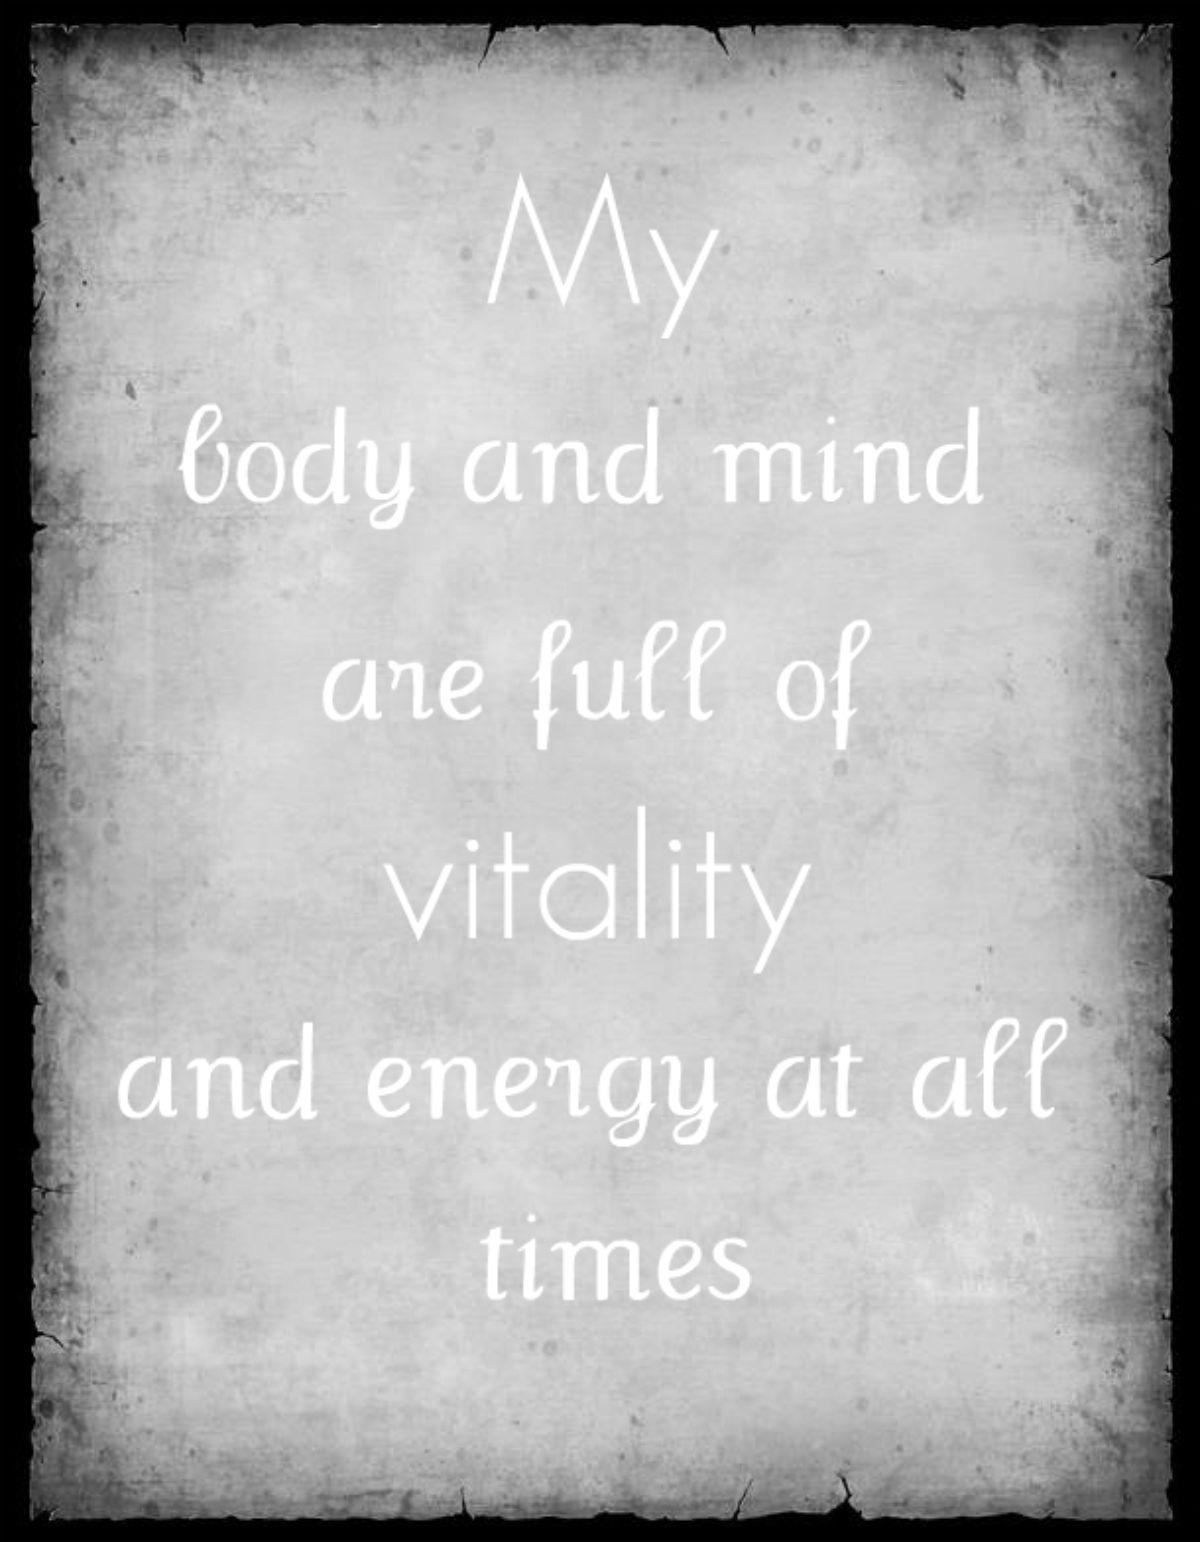 Energy Quotes Vitality Energy Quote  Happy Quotes  Pinterest  Energy Quotes